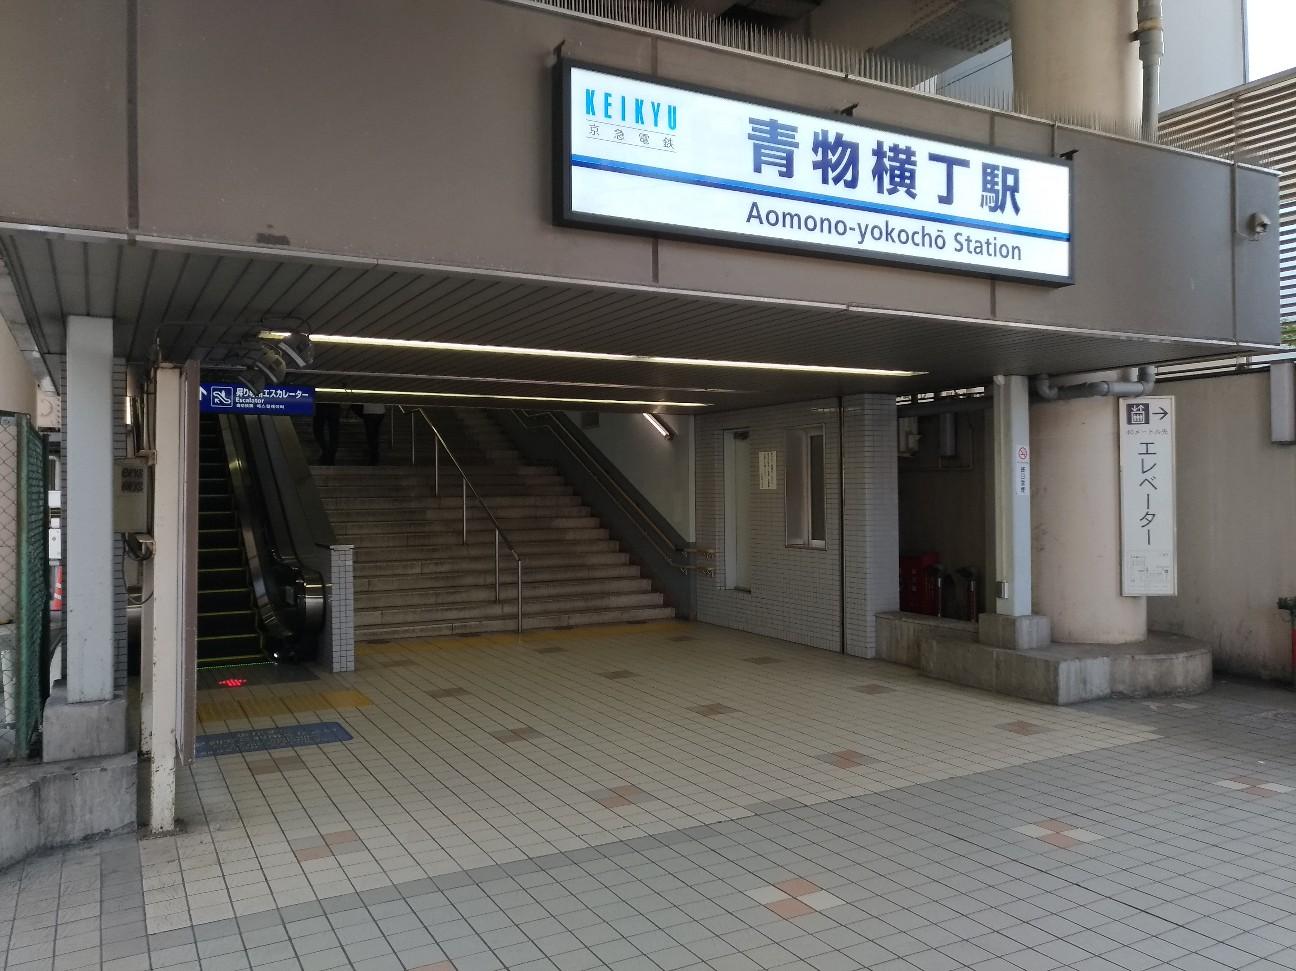 f:id:HKT1989:20200617151948j:image